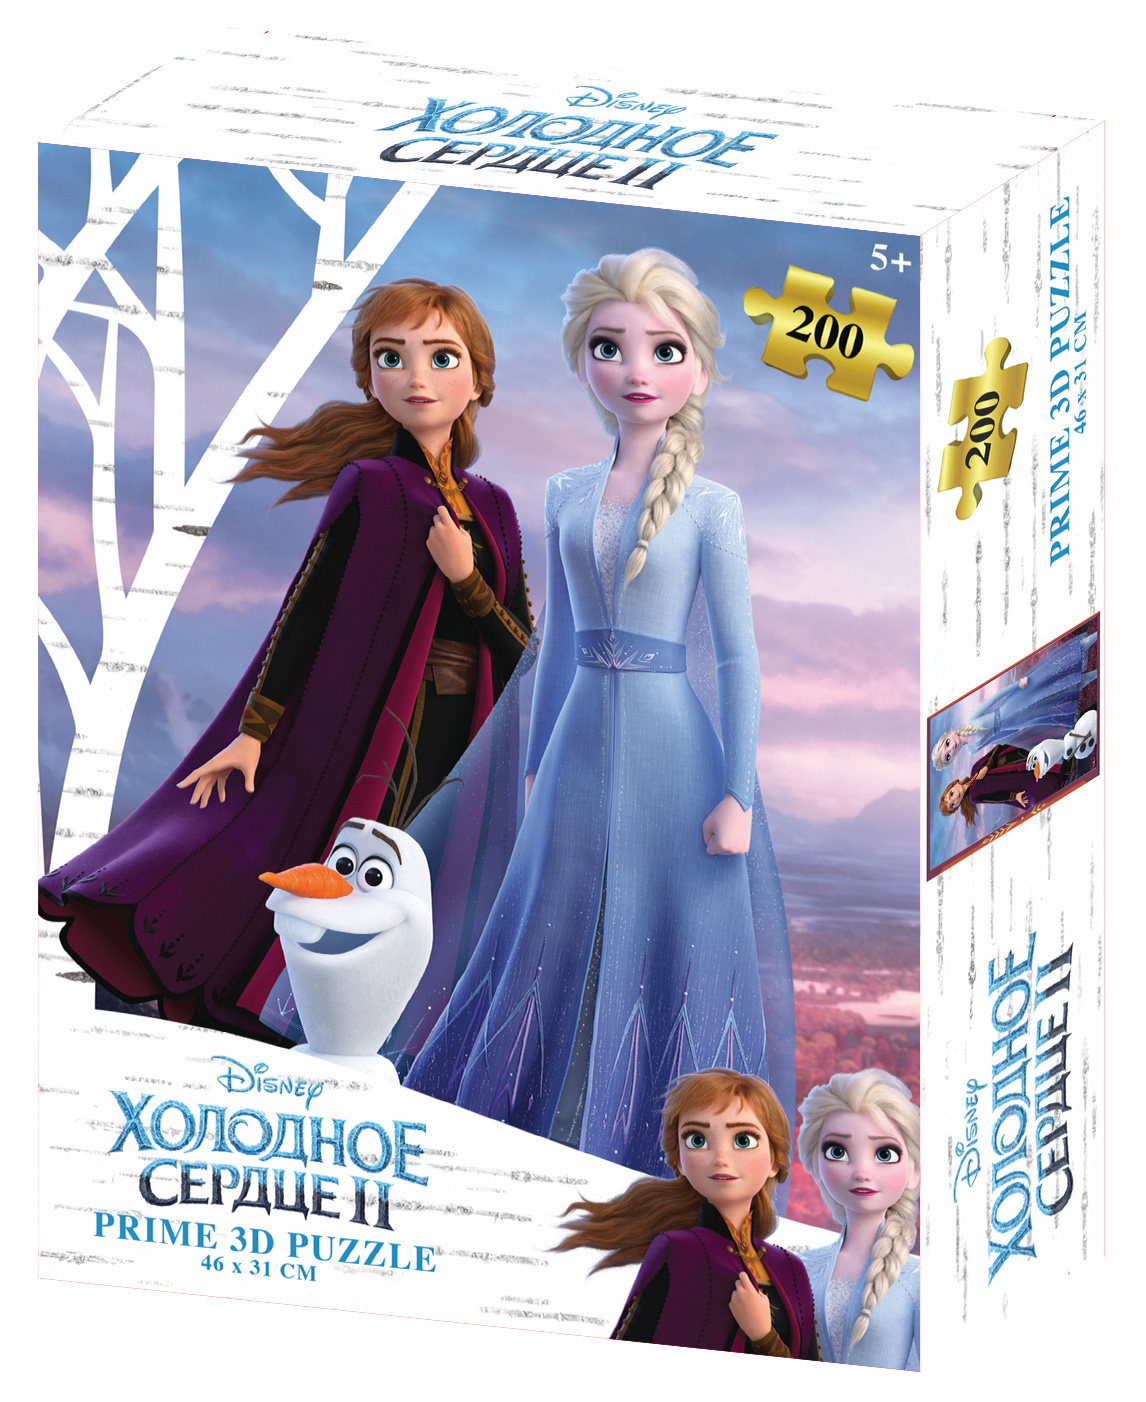 Prime 3D Puzzle: Disney – Холодное Сердце 3 (200 элементов) prime 3d puzzle disney – история игрушек 2 100 элементов